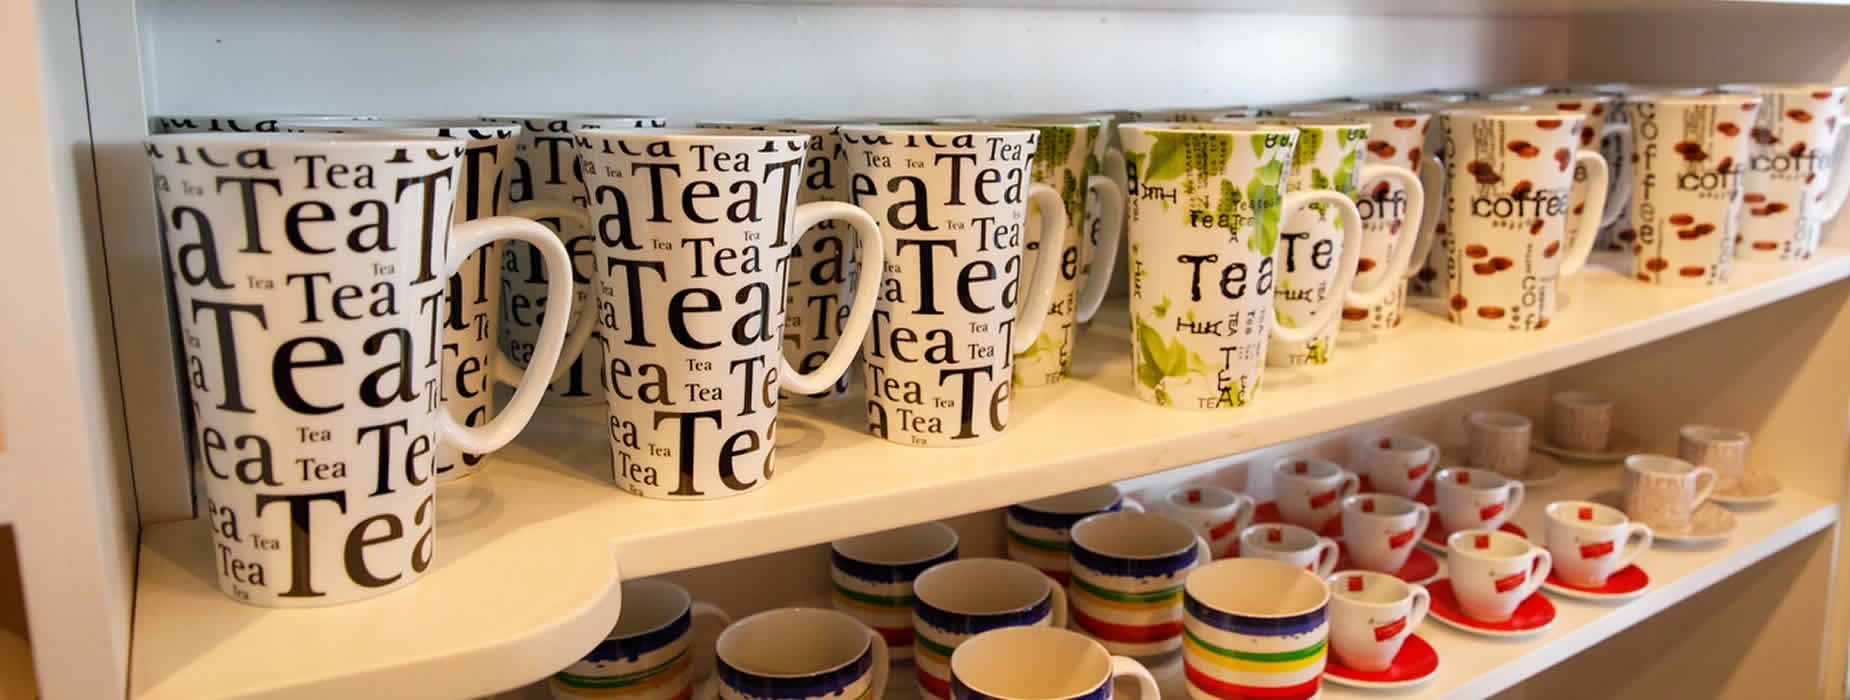 Tea and Coffee Mugs